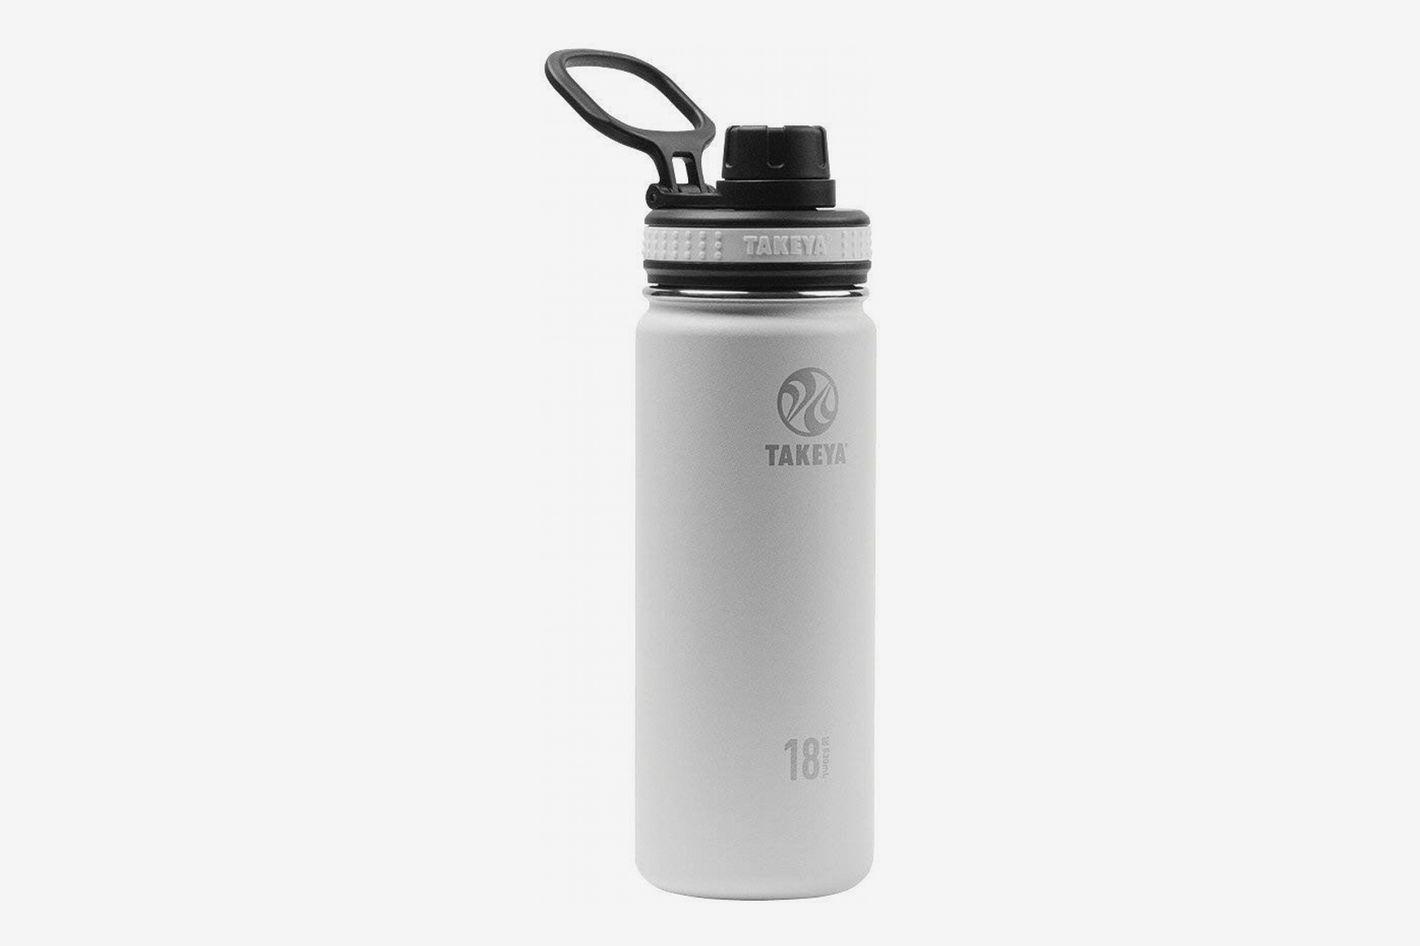 takeya originals vacuum insulated stainless steel water bottle